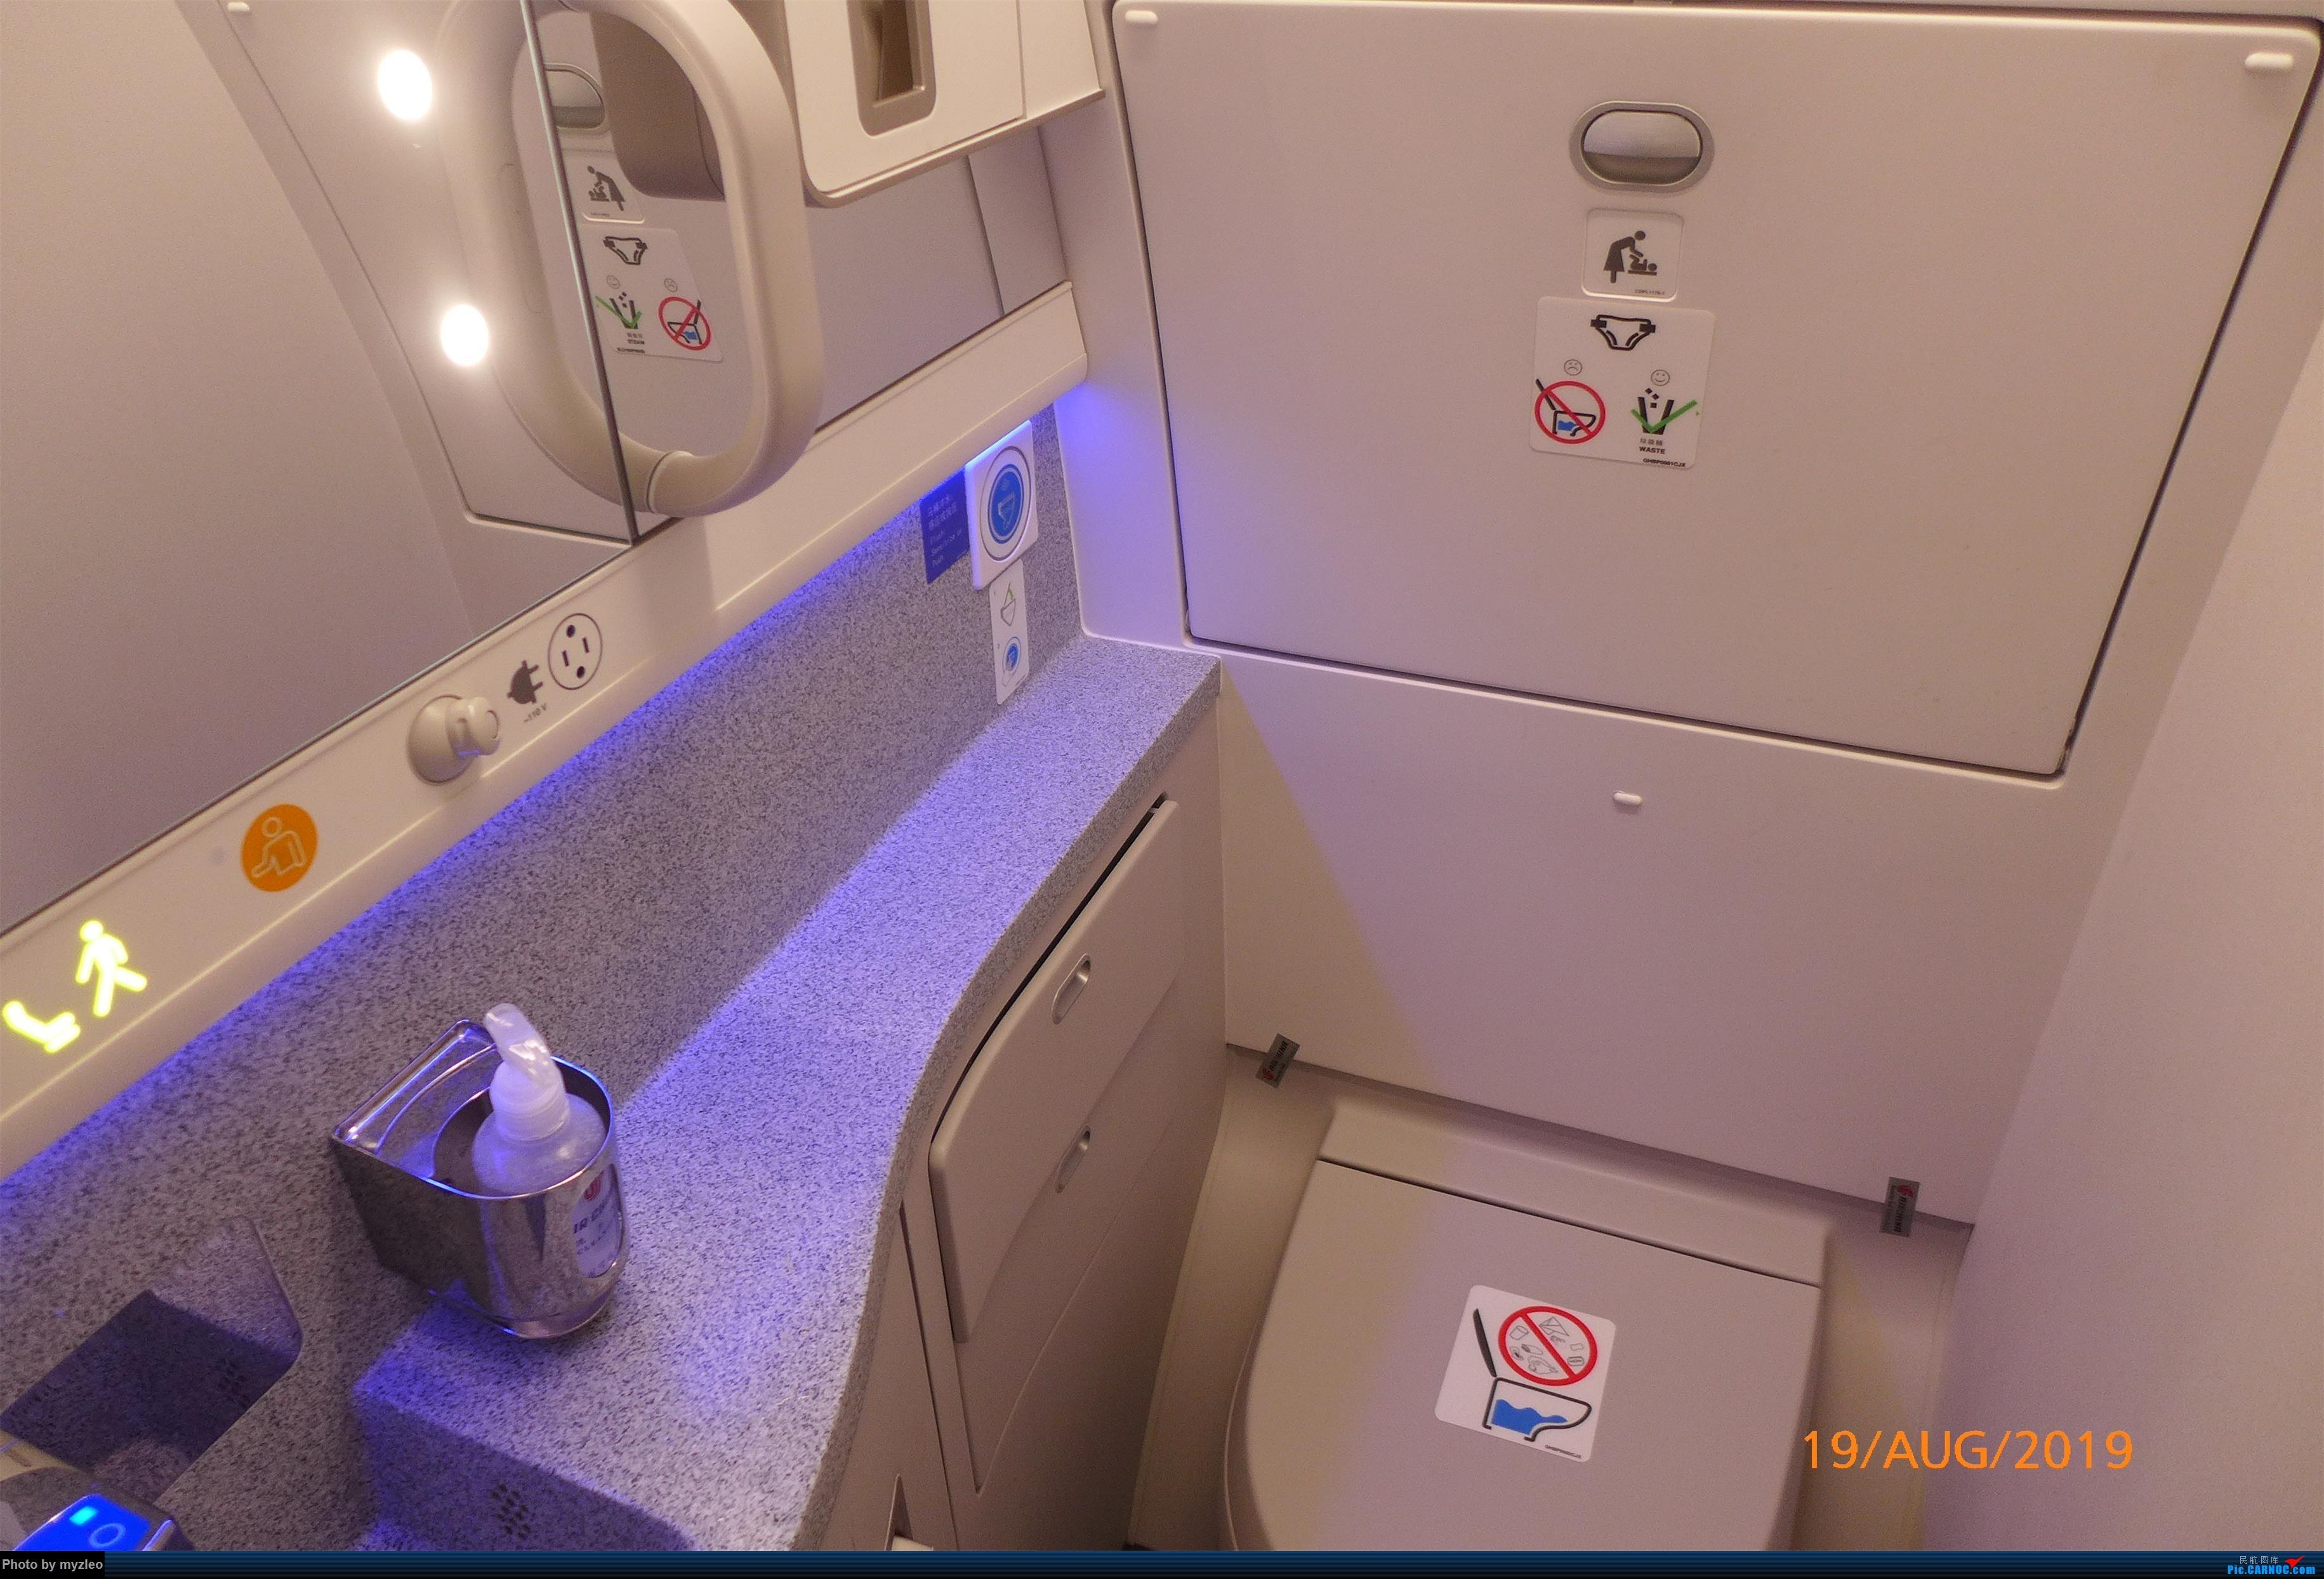 Re:[原创]【myzleo的游记5.1】梦圆一九(1)首搭国航359,北京城里到处走 AIRBUS A350-900 B-1081 中国上海虹桥国际机场